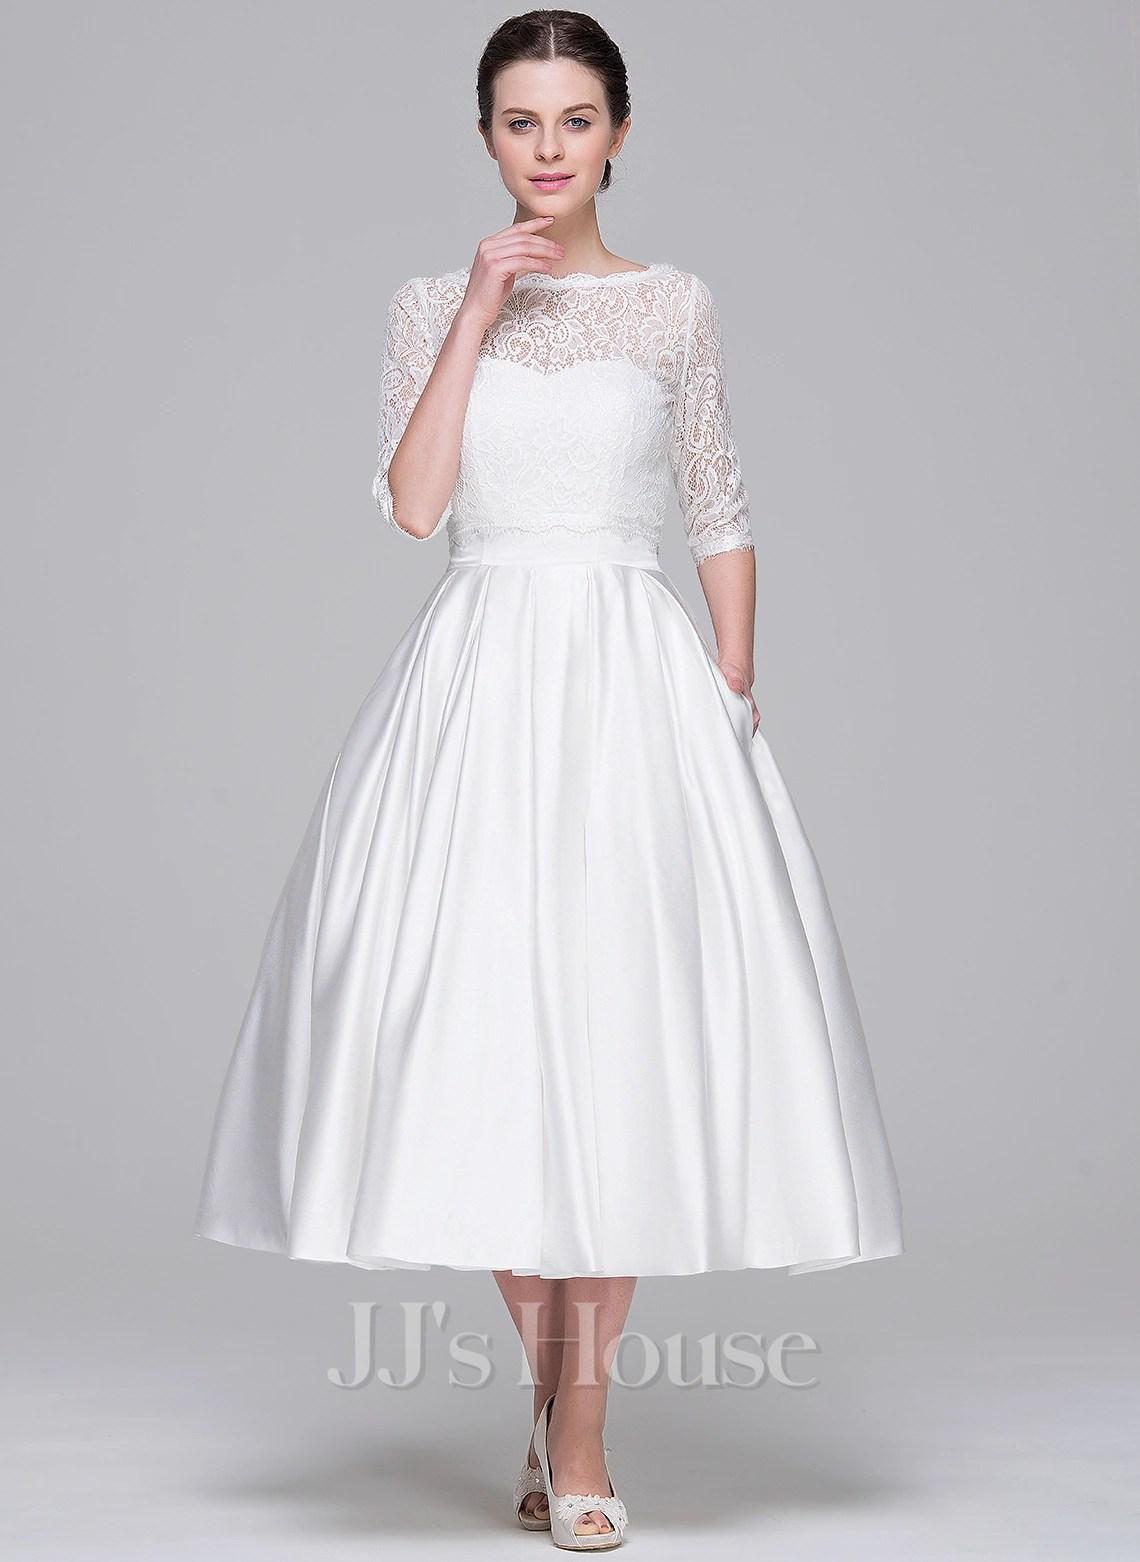 A Line Princess Sweetheart Tea Length Satin Wedding Dress g jjshouse wedding dress Home Wedding Dresses Loading zoom